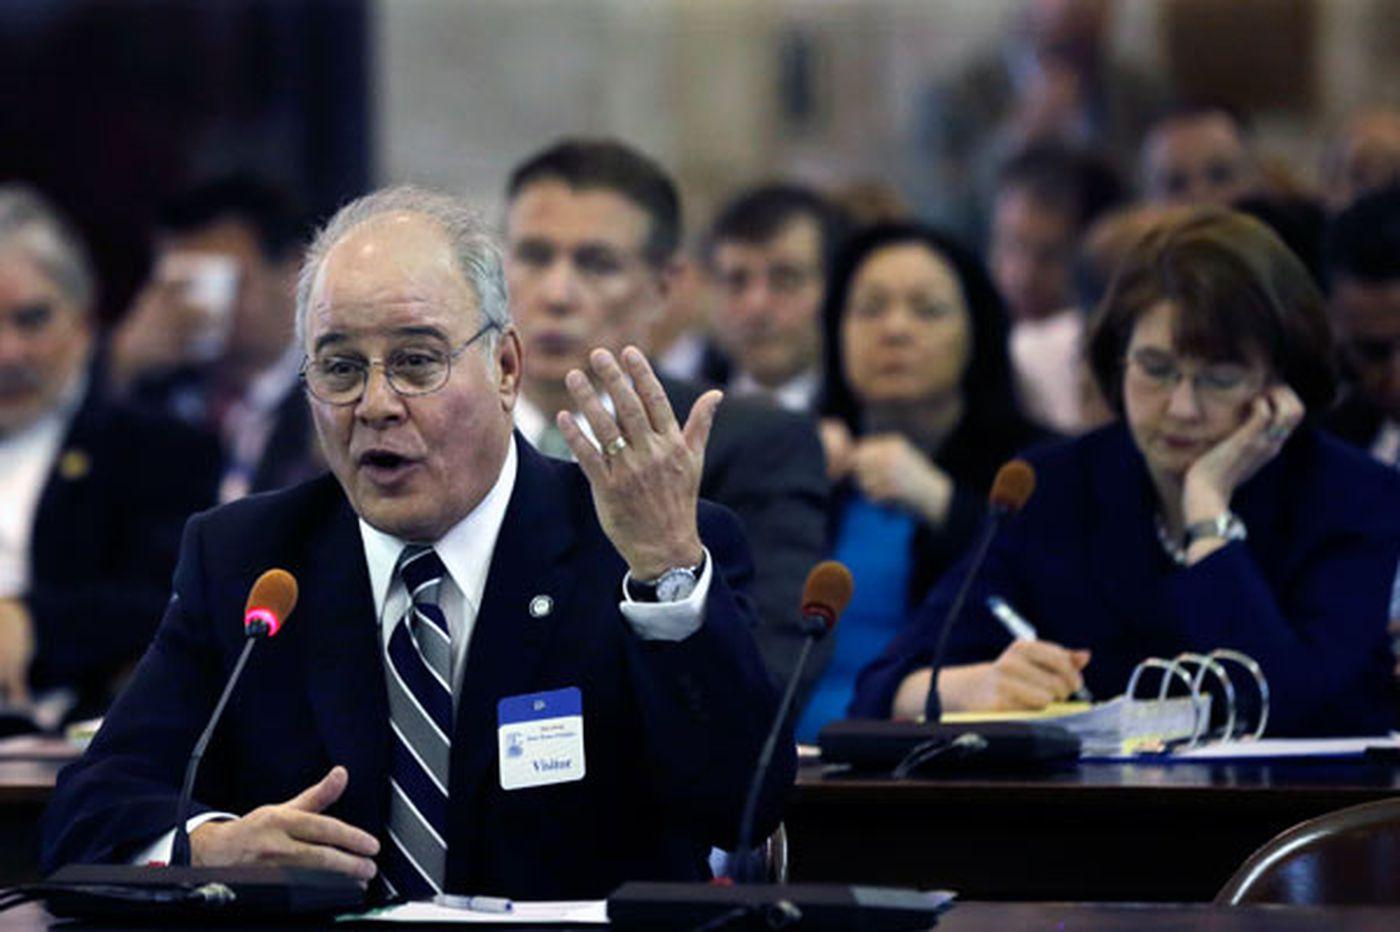 Amid turmoil, Stockton's acting president drops plan to leave